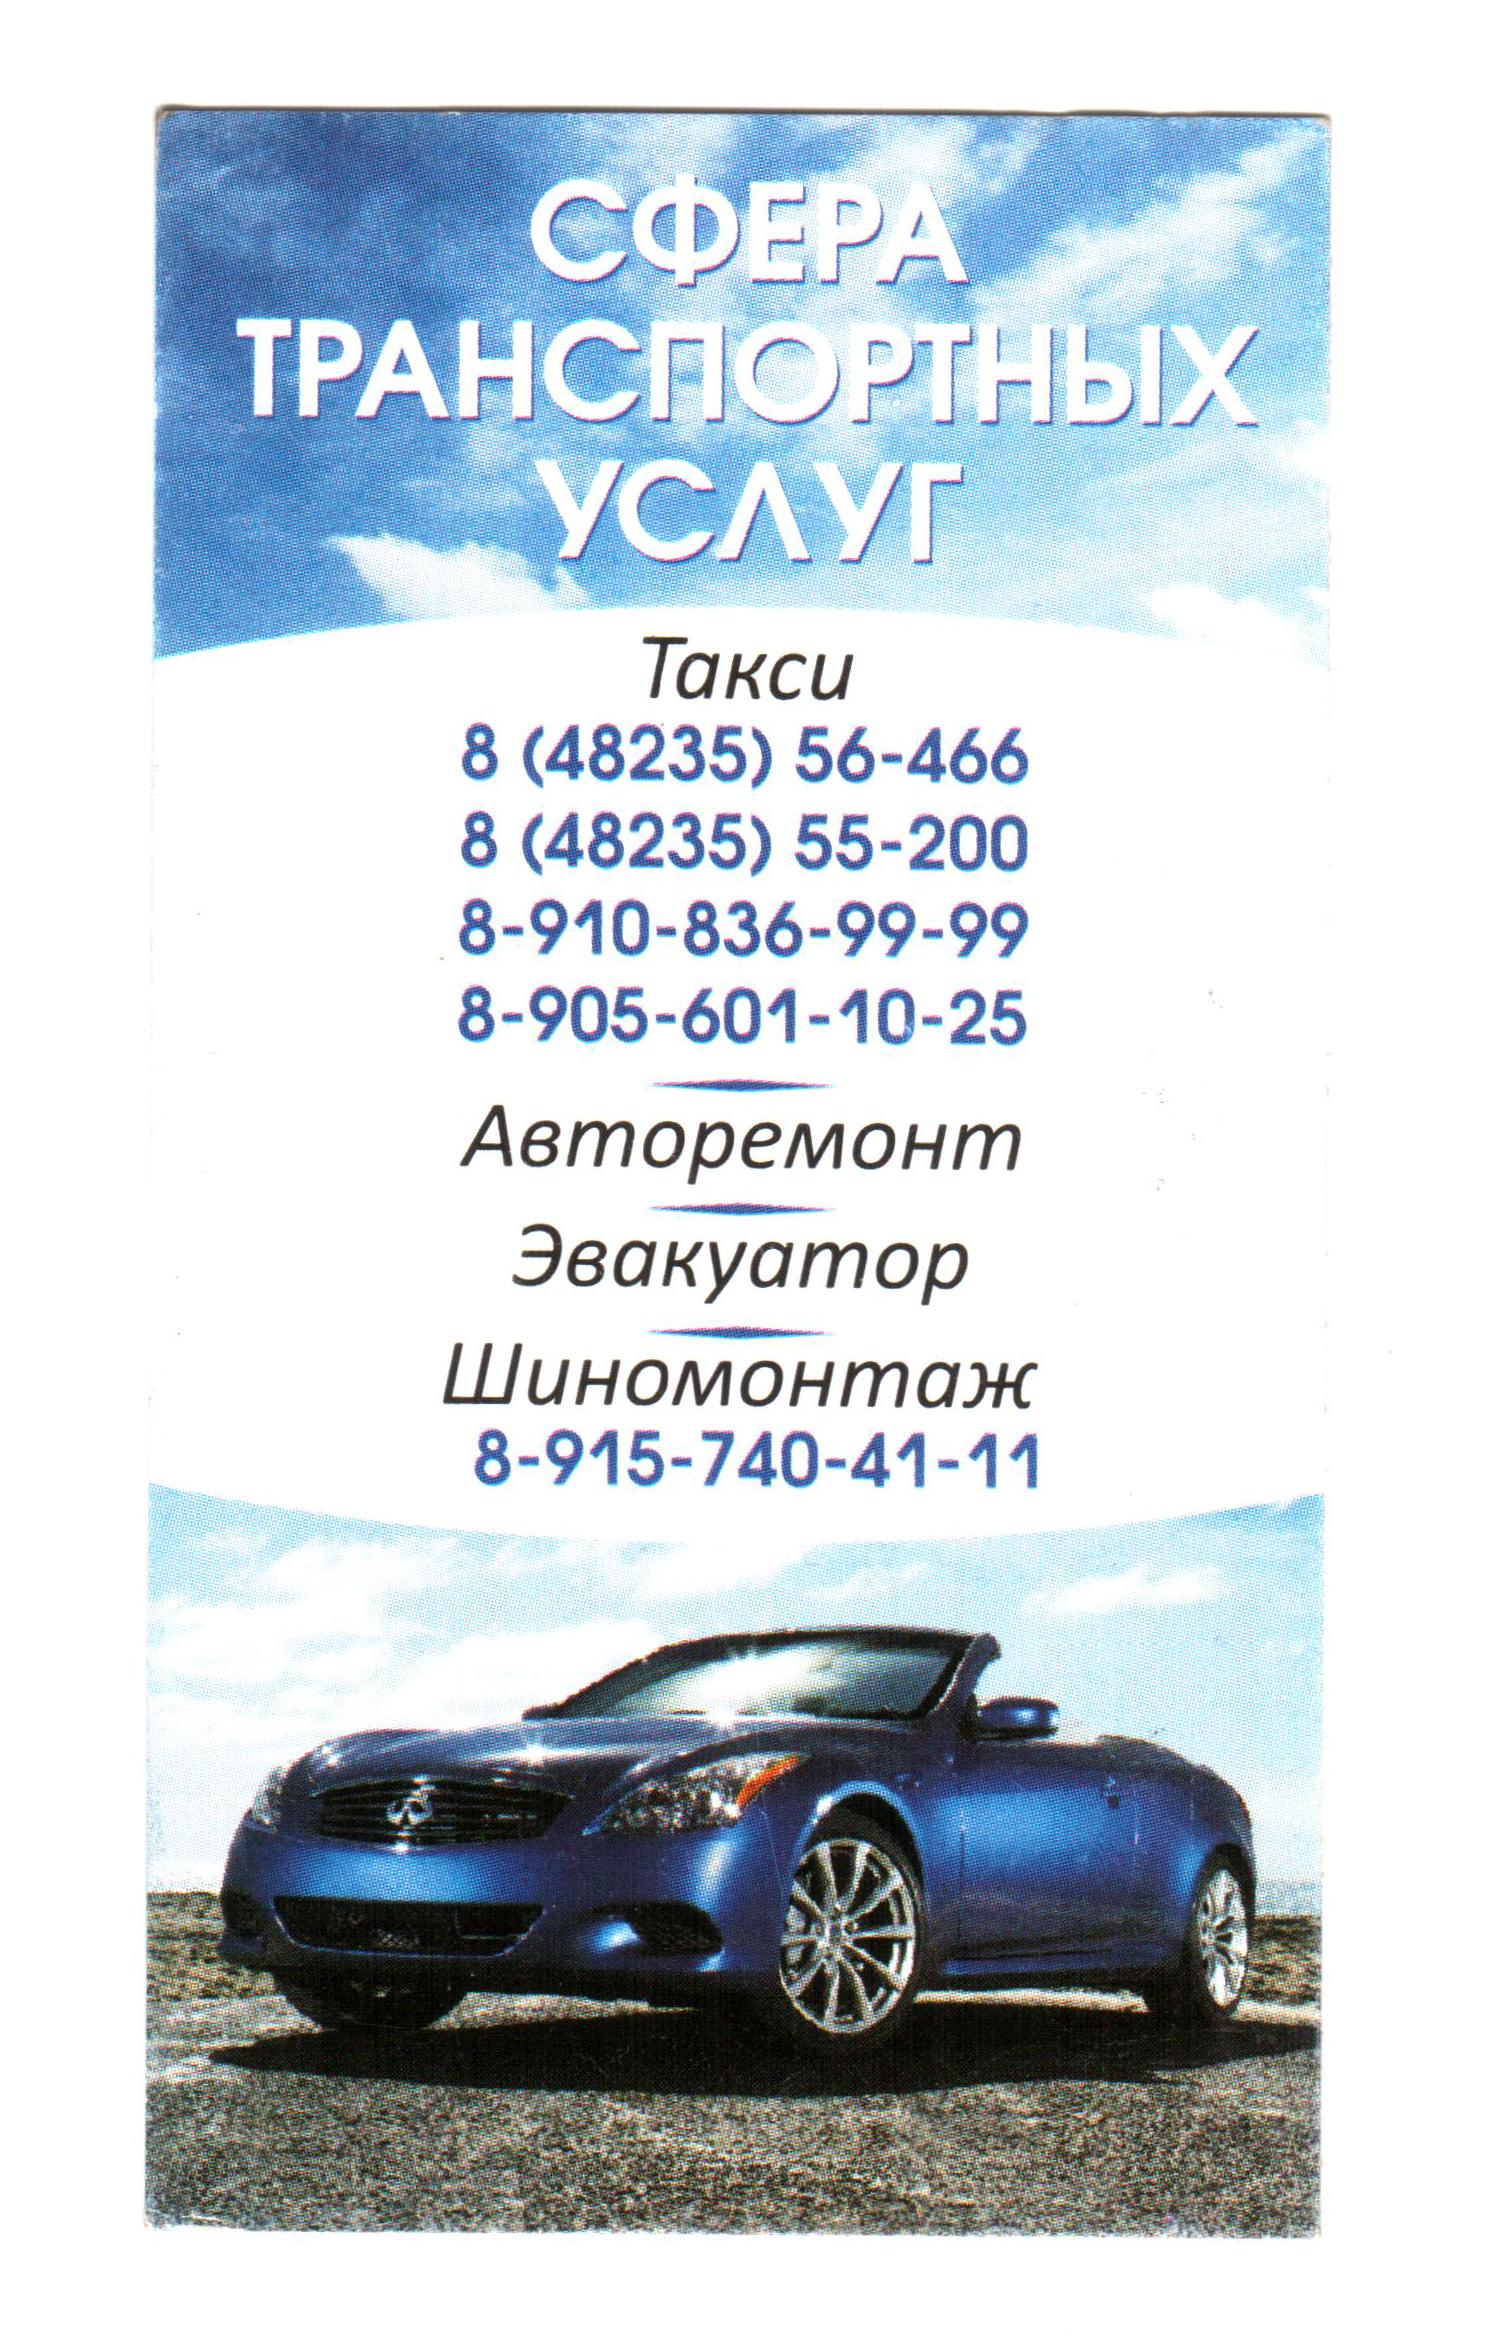 http://img-fotki.yandex.ru/get/9259/17259814.f/0_7e088_7a41b12c_orig